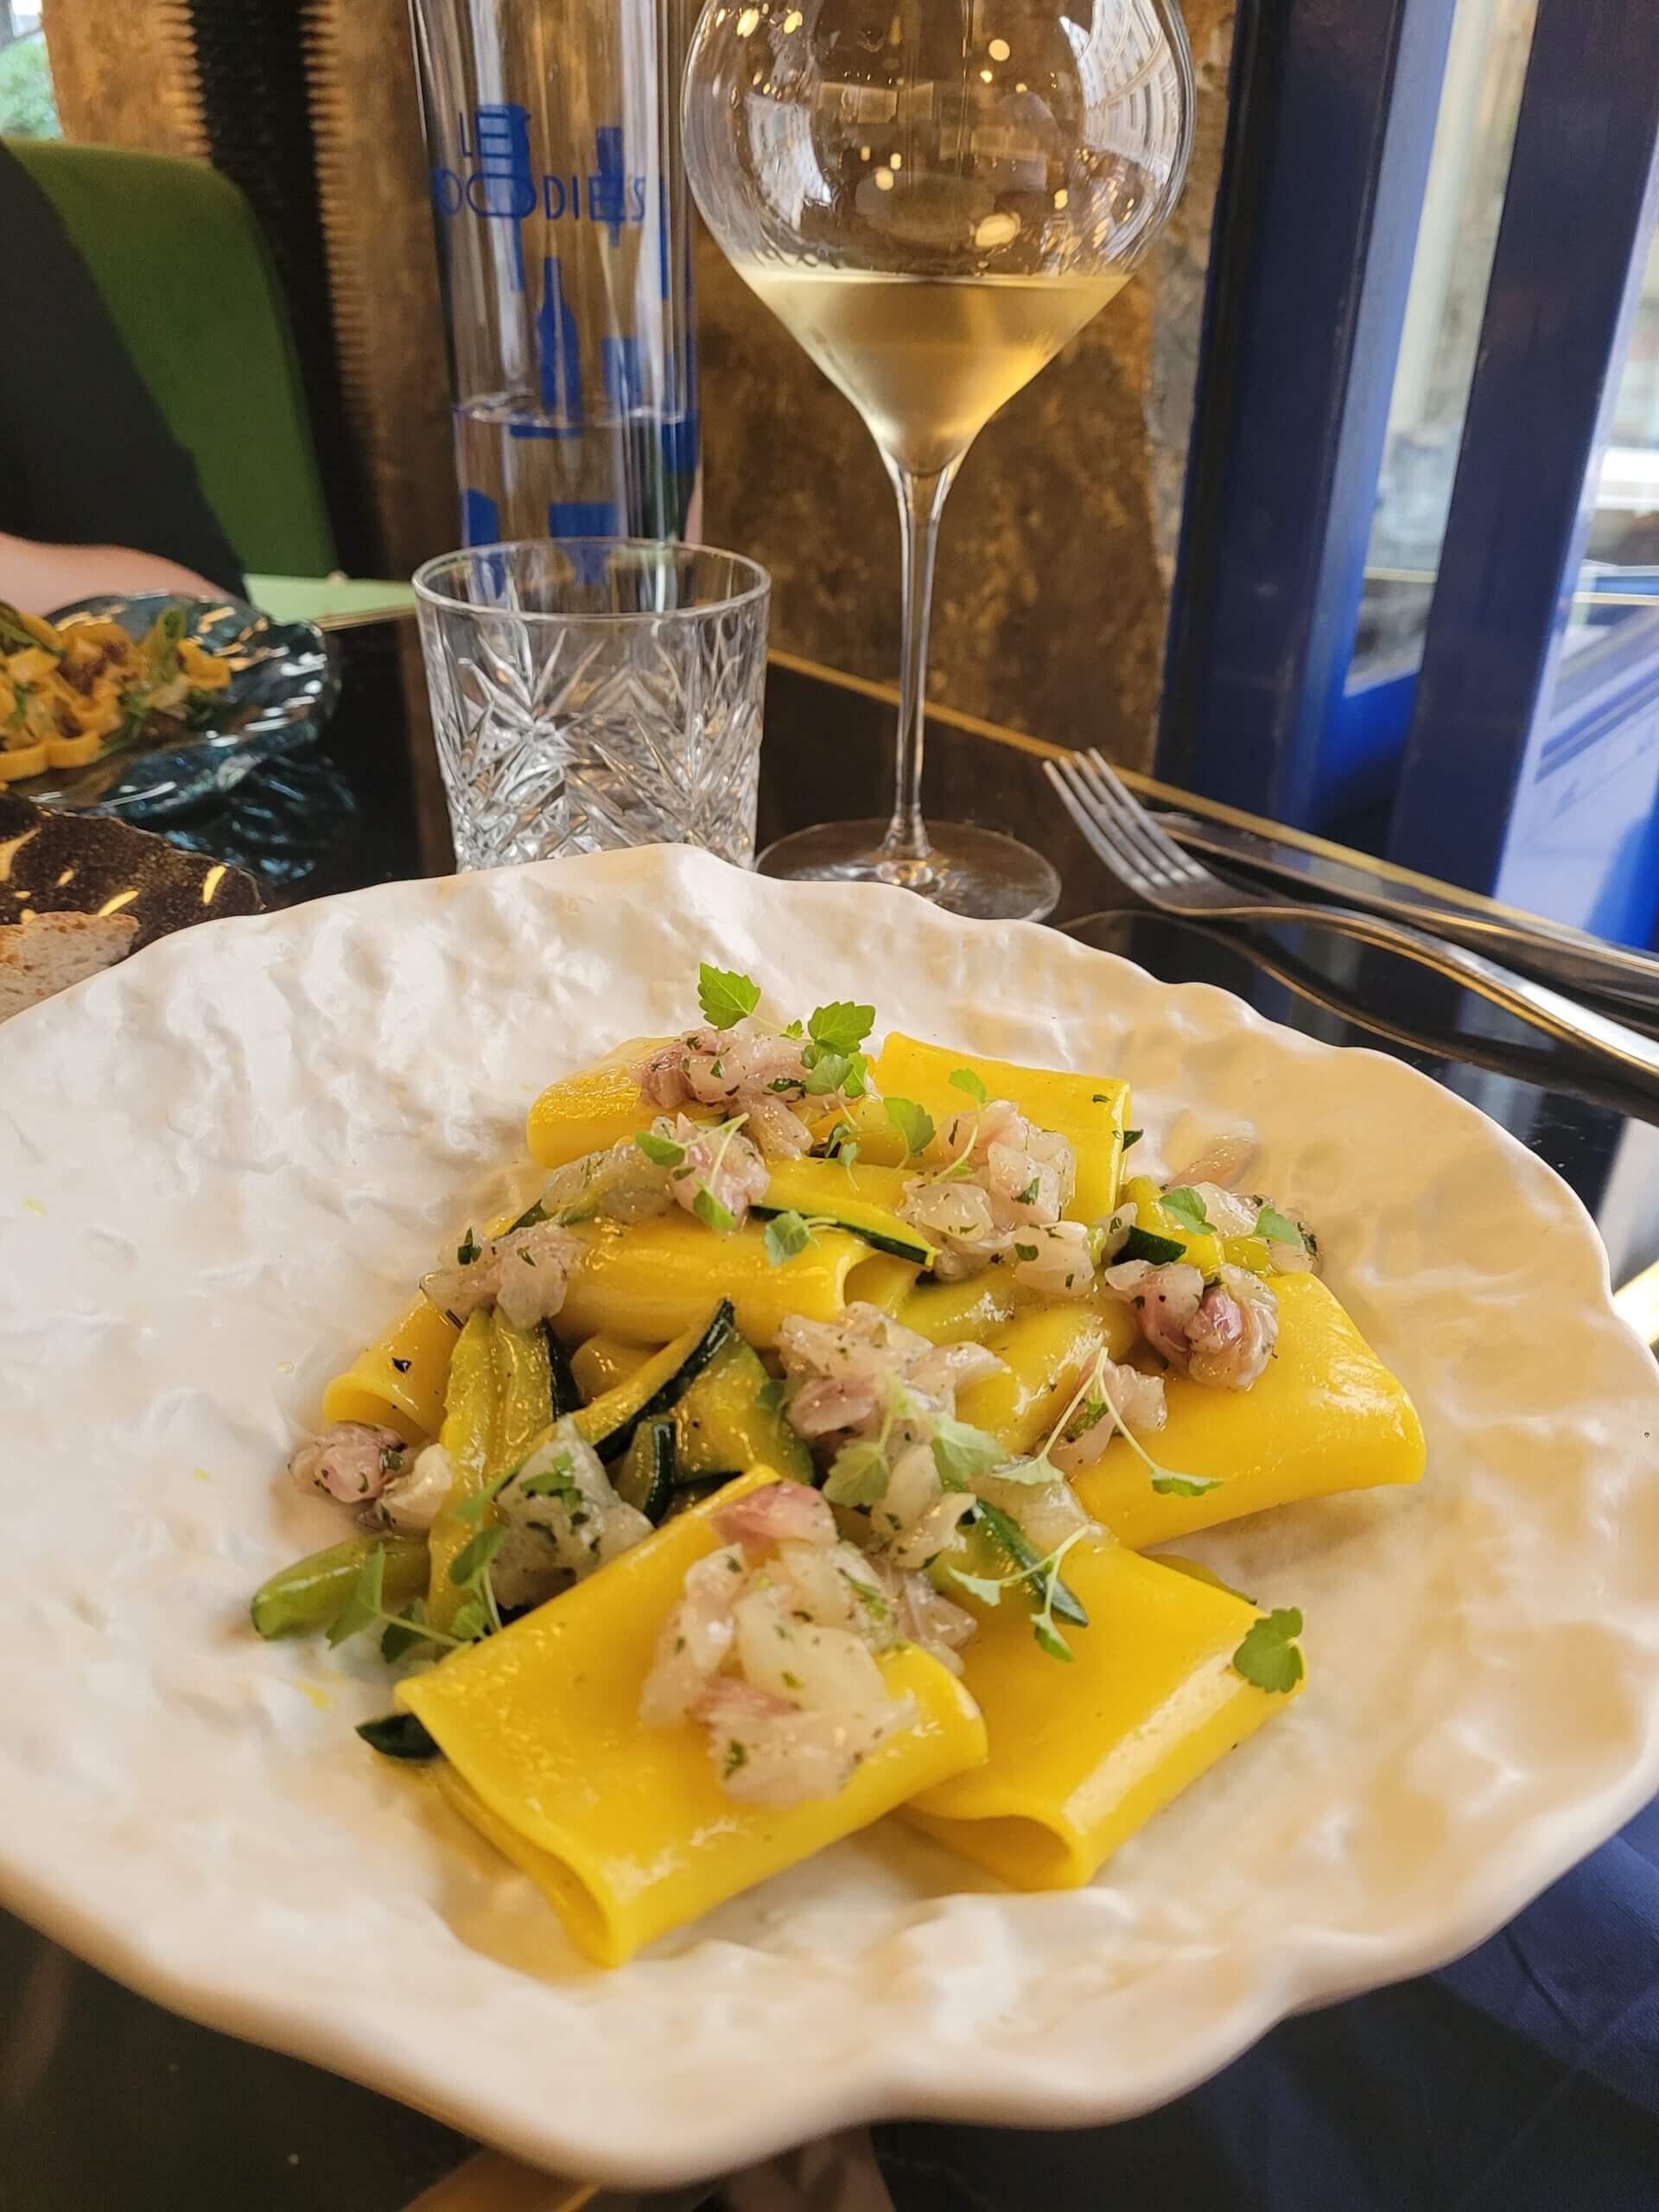 Les Foodies Paris Lunch Empfehlung